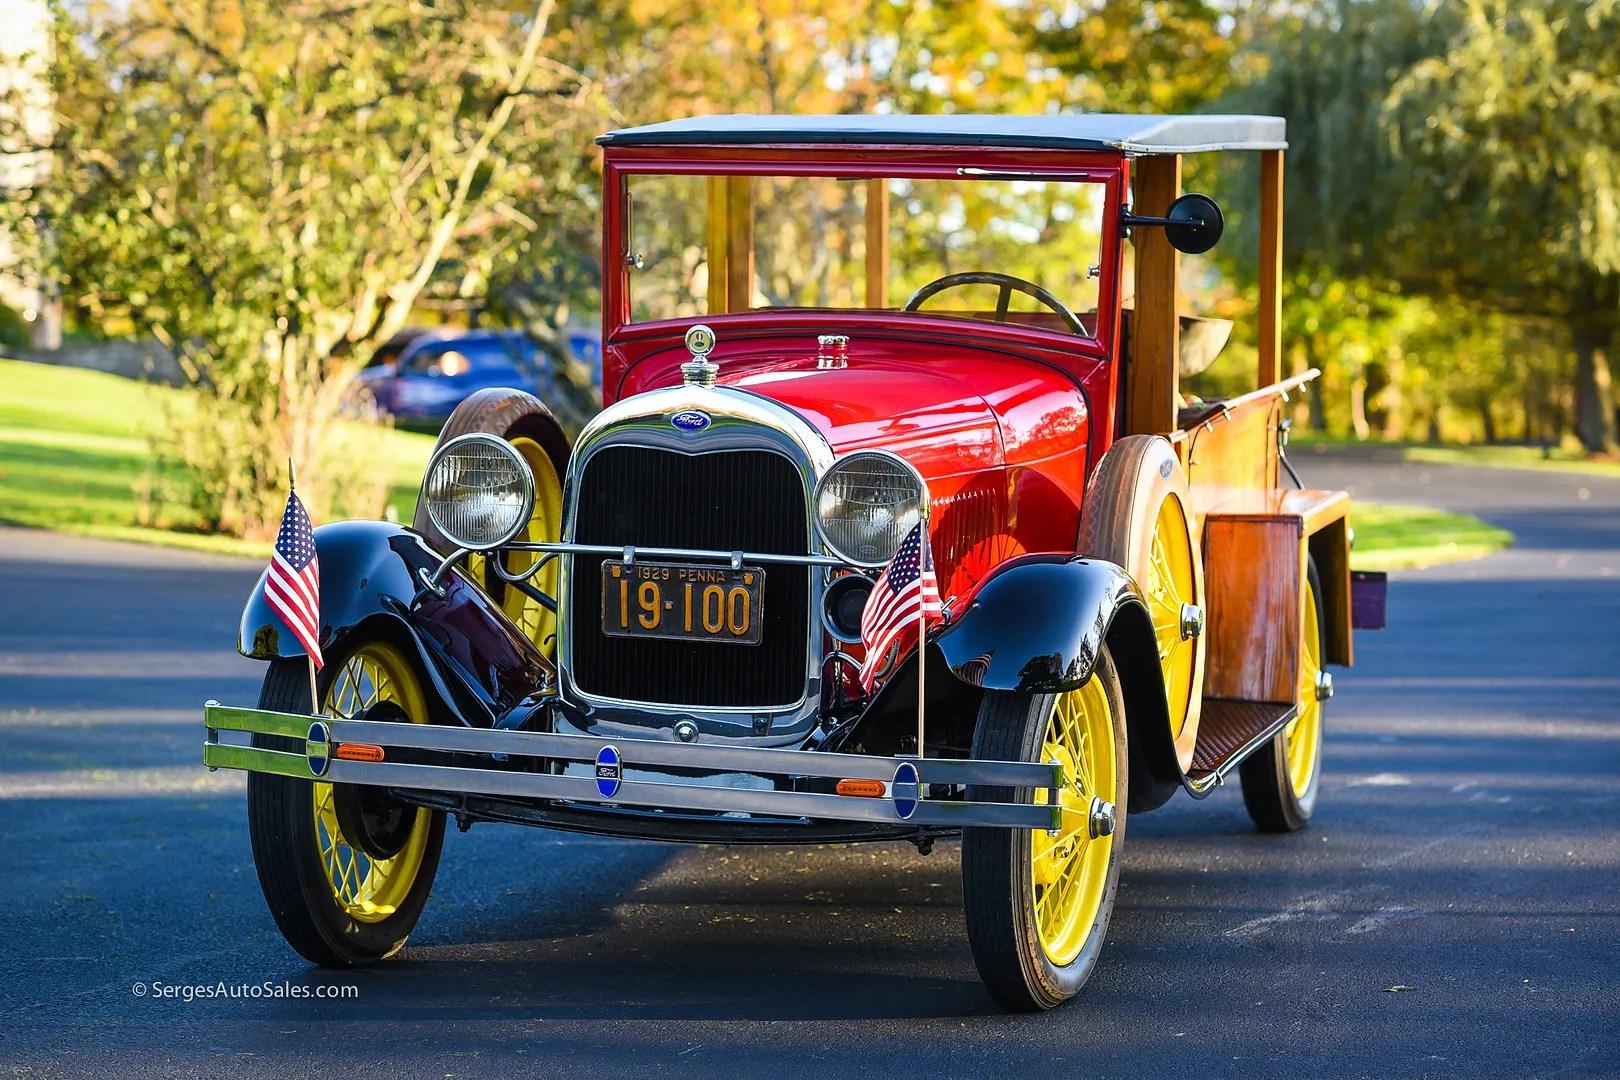 photo 1929-Ford-Model-A-Huckster-for-sale-serges-auto-sales-northeast-pennsylvania-scranton-muscle-cars-corvettes--2_zpspc4sifhm.jpg